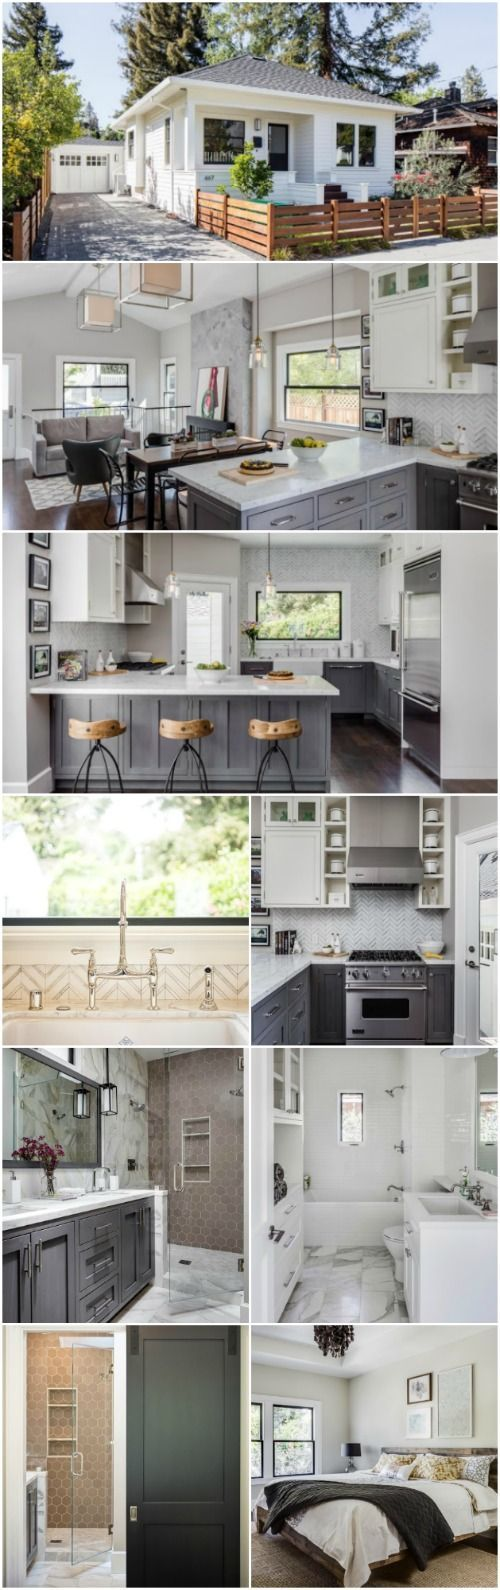 Californian Interior Designer Designs Dreamy Tiny House In Napa Valley Gray Color Schemetle